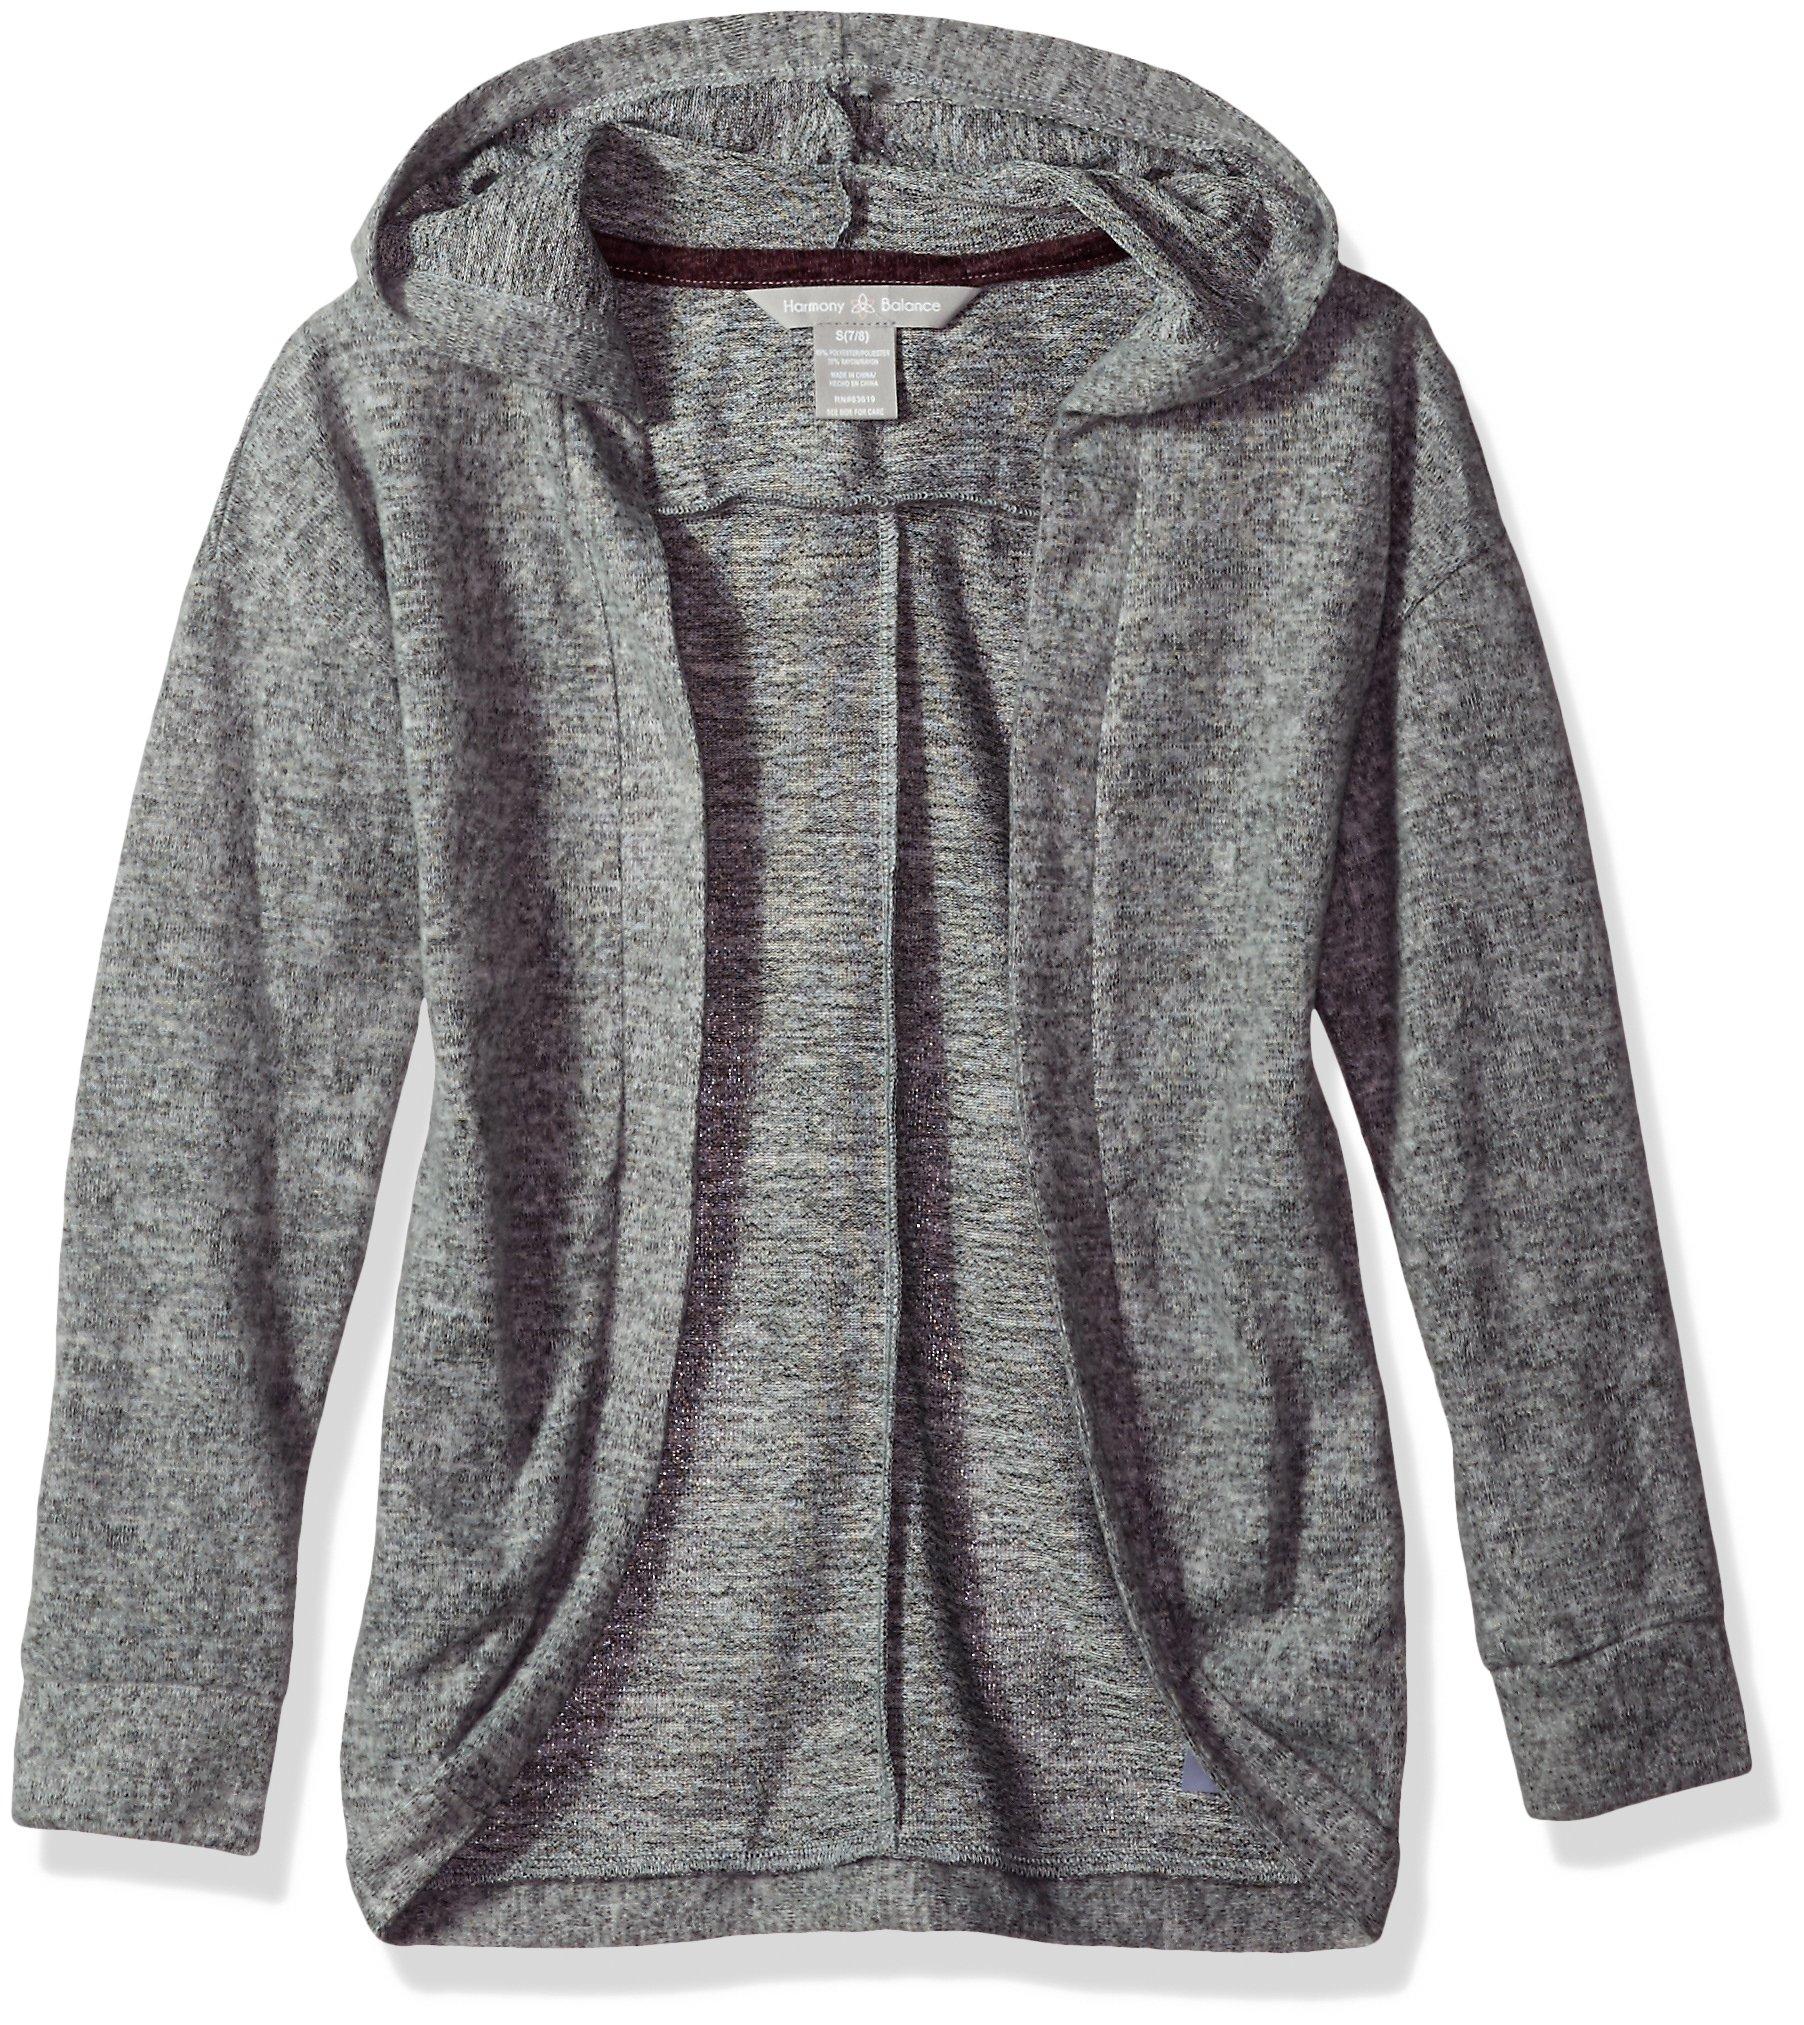 Harmony and Balance Girls' Big Long Sleeve Sweater Knit Top, Gray Heather, 7/8